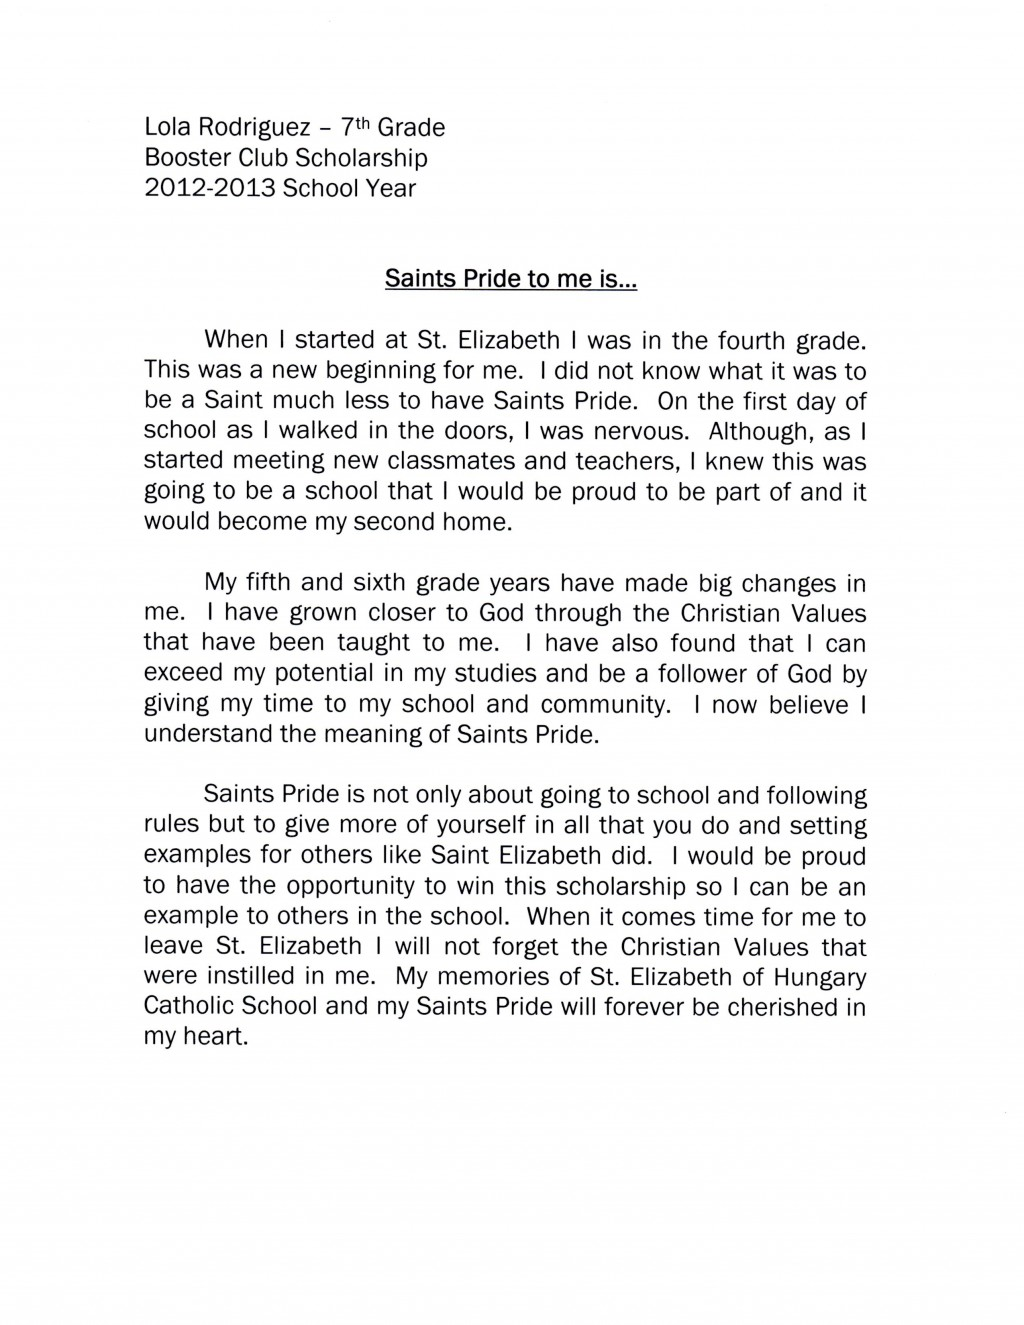 013 Format Scholarship Essay Example Lola Sensational Sample College Essays For Writing Large